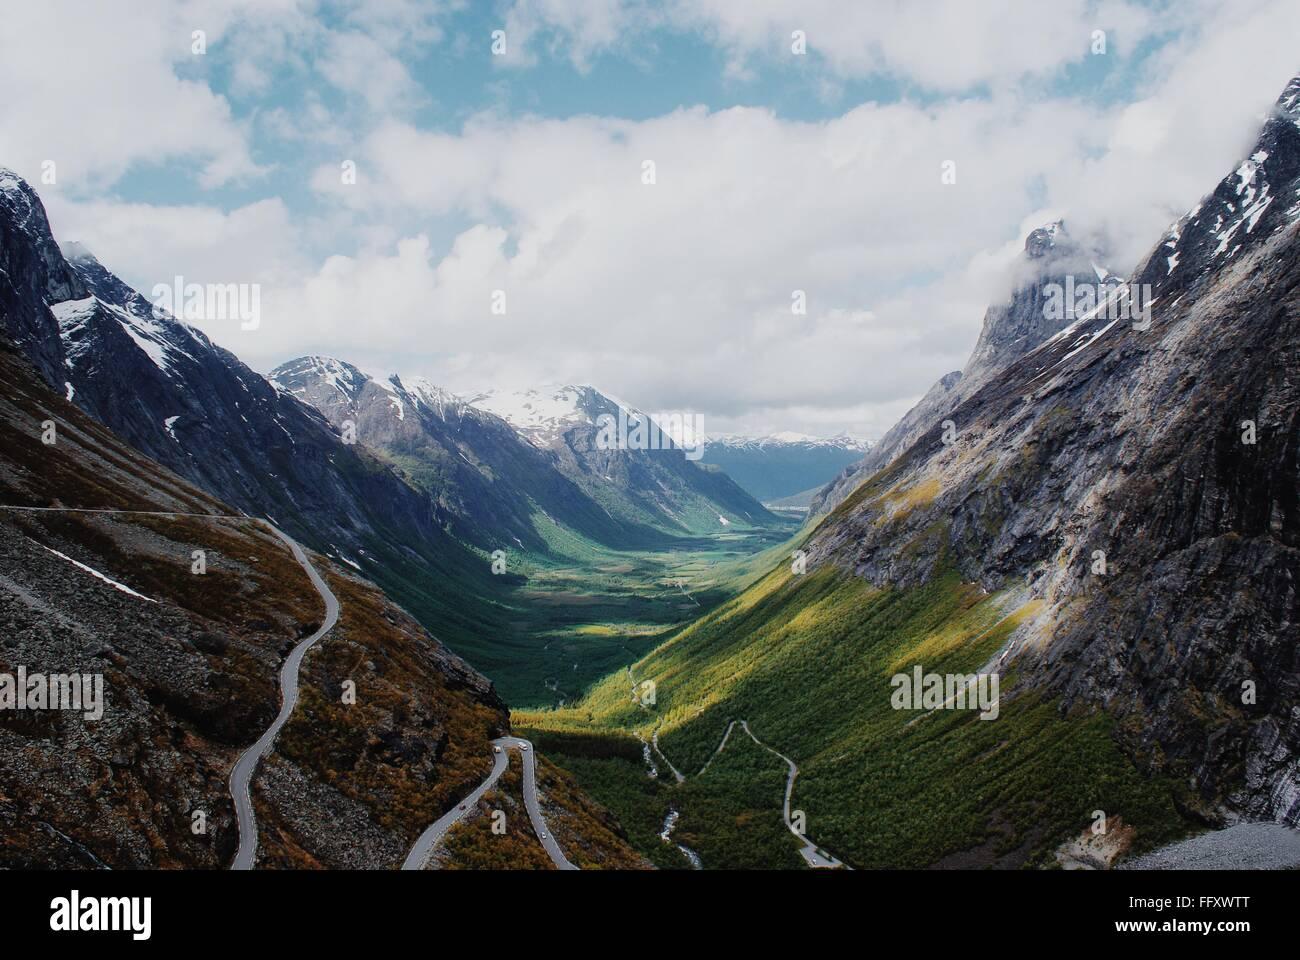 Idyllic Shot Of Trollstigen In Andalsnes Against Sky - Stock Image